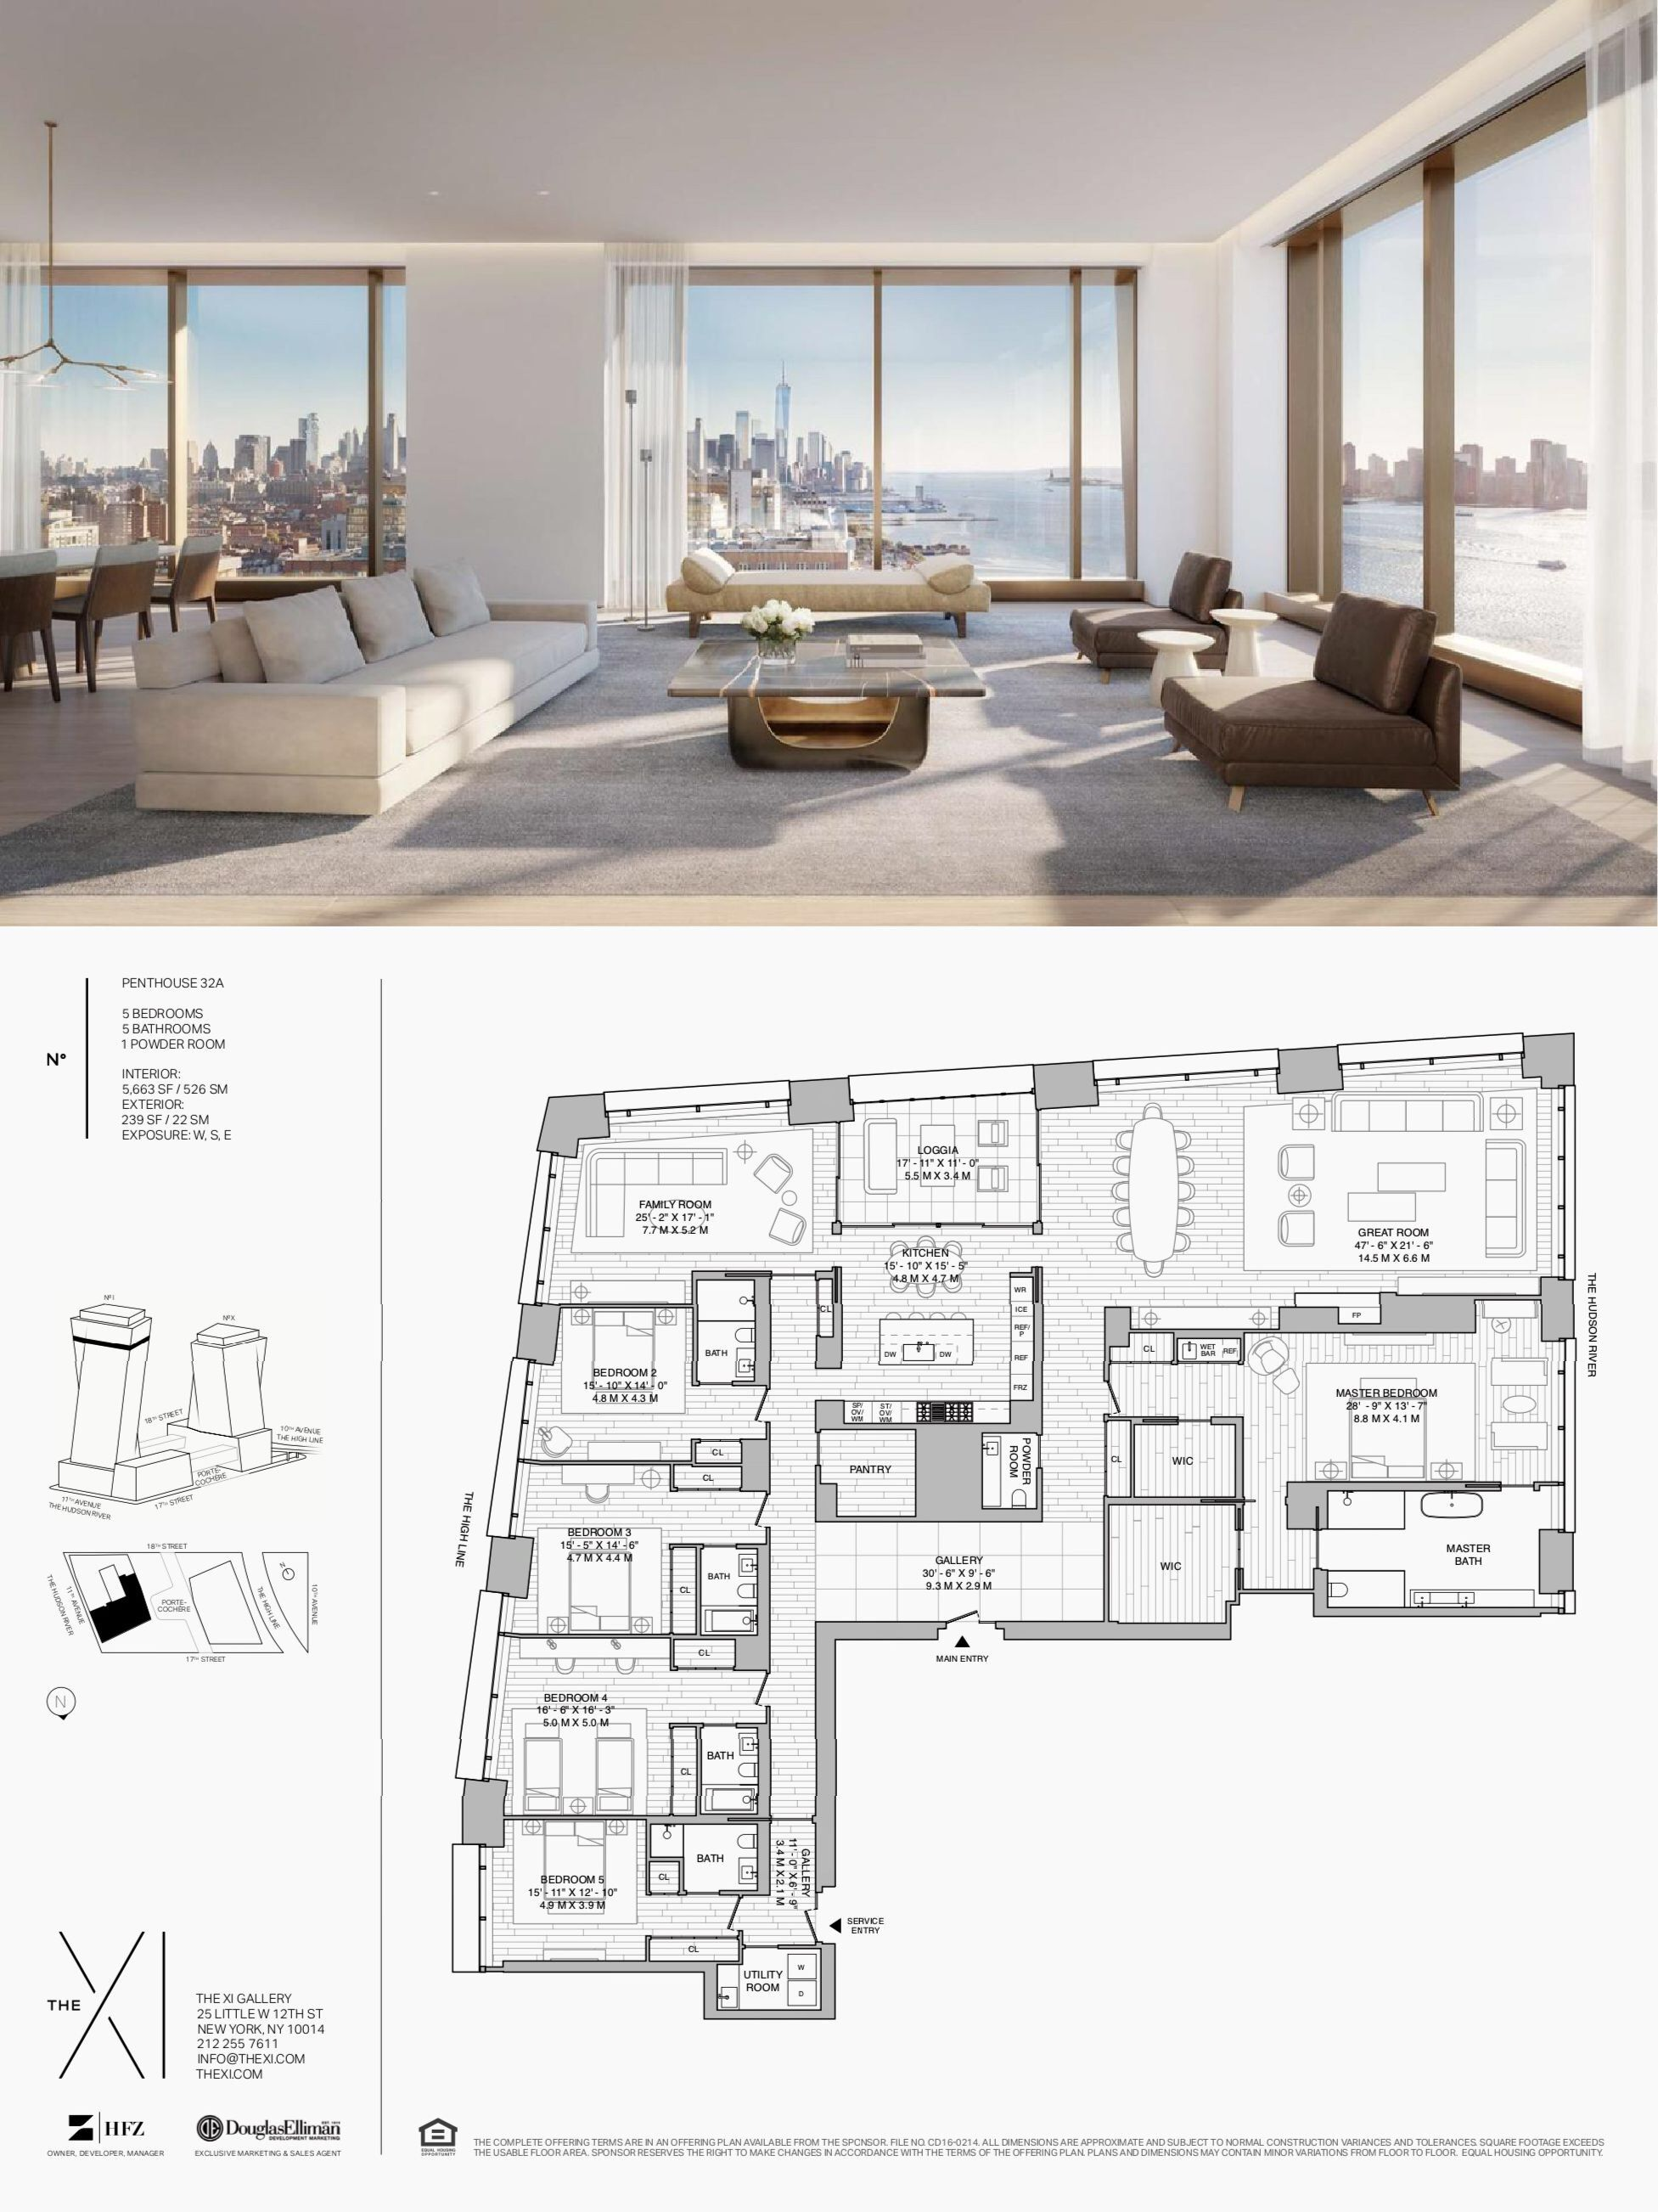 The Xi Penthouse 32a Penthouse Apartment Floor Plan Home Building Design Luxury Penthouse